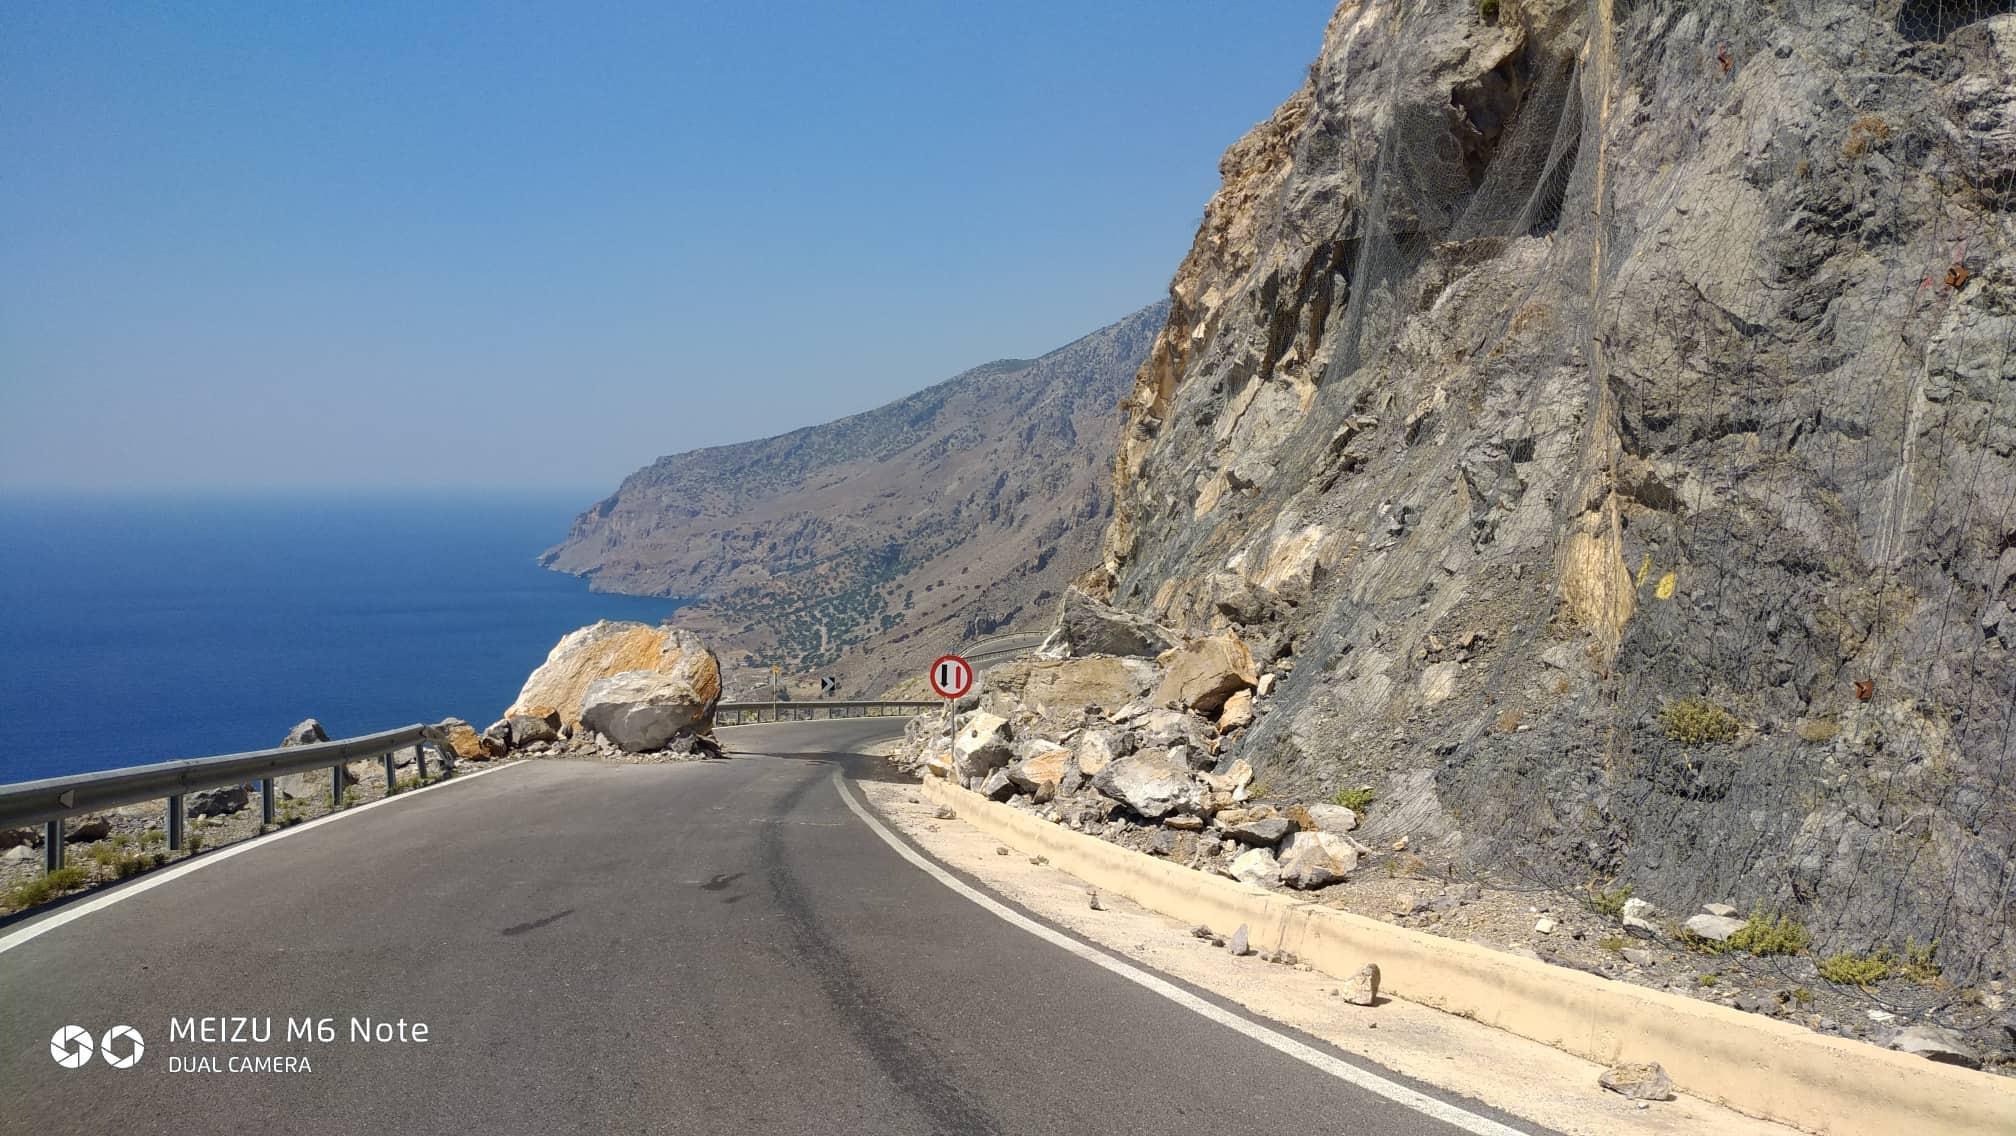 68934793_482625322513479_6542699066986332160_n Αμετακίνητος ακόμη ο βράχος μέσα στο δρόμο!